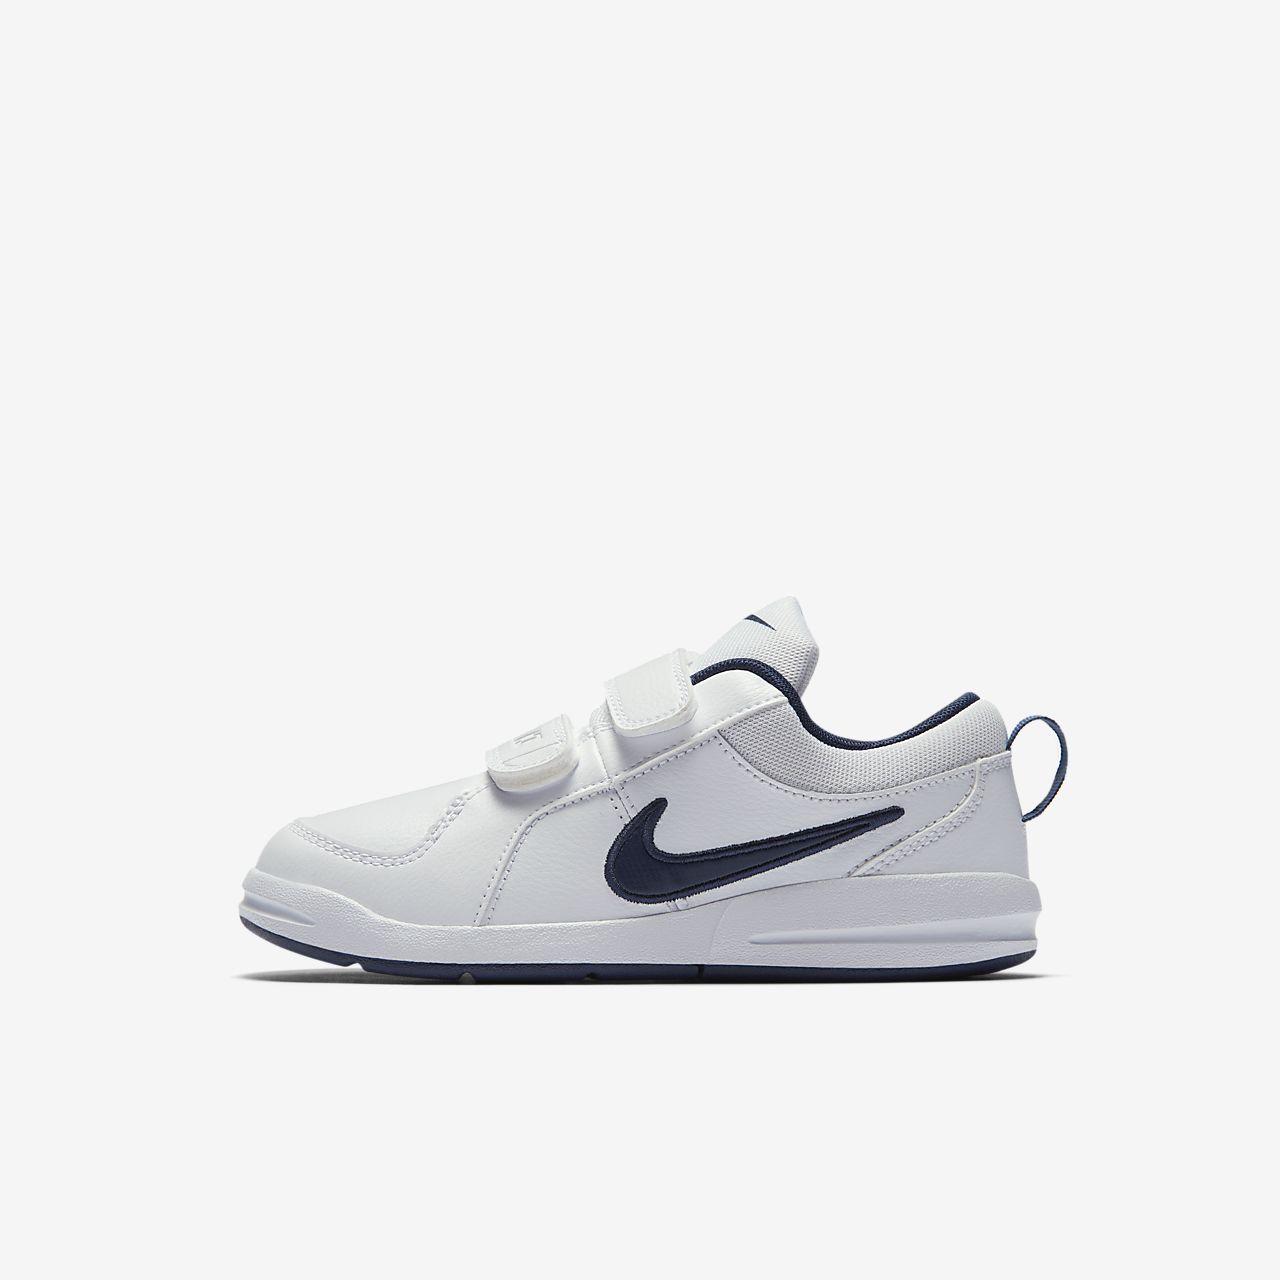 quality design d4e25 d9002 ... Scarpa Nike Pico 4 - Bambino